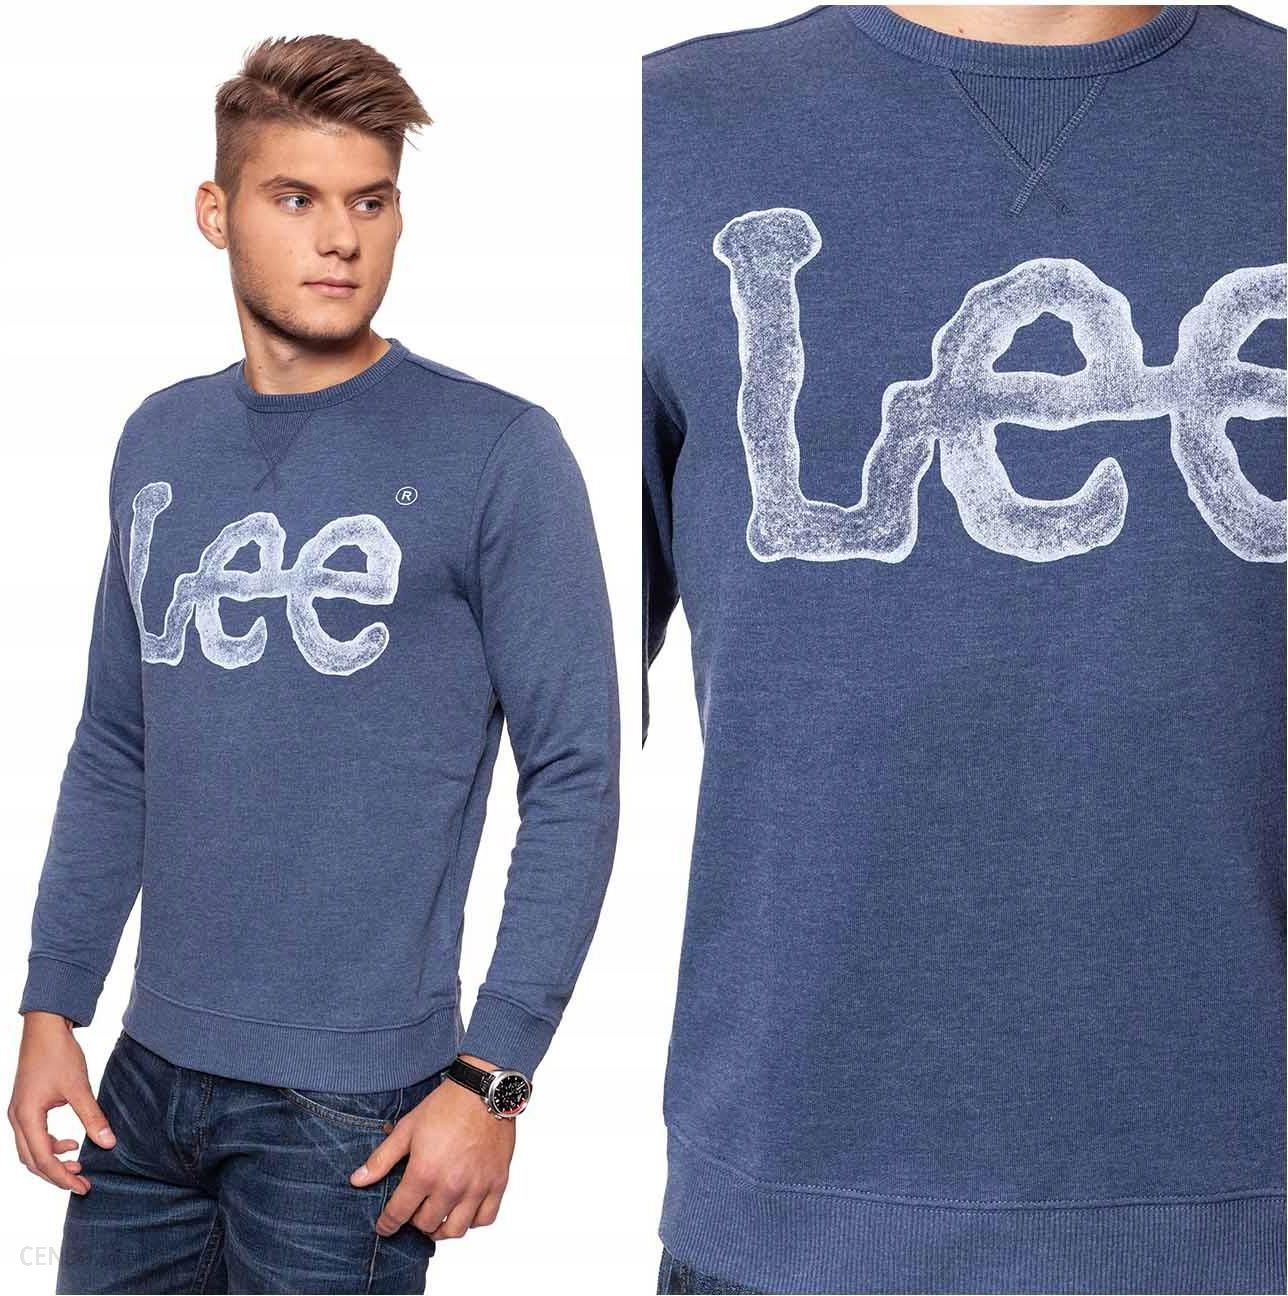 8f821163 Lee Logo Sweatshirt Bluza Męska Granatowa L - Ceny i opinie - Ceneo.pl